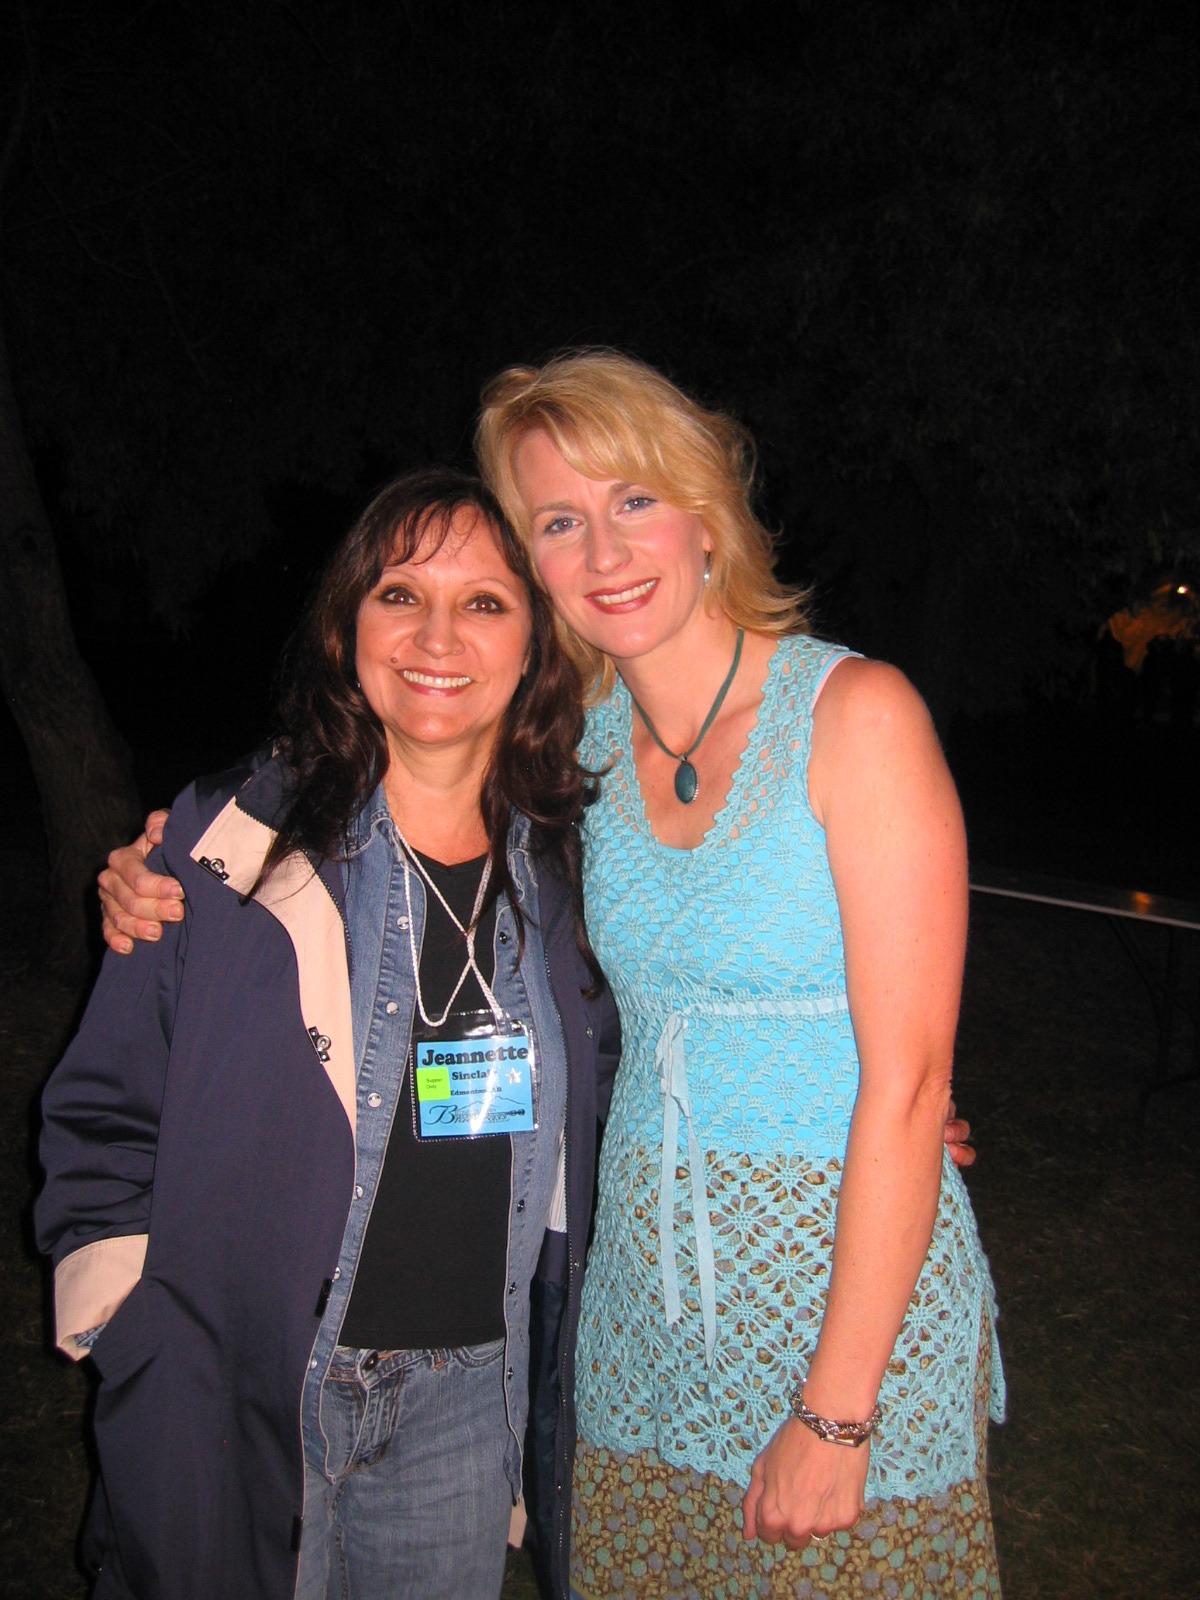 Jeannette with Sally Jones August 19, 2008